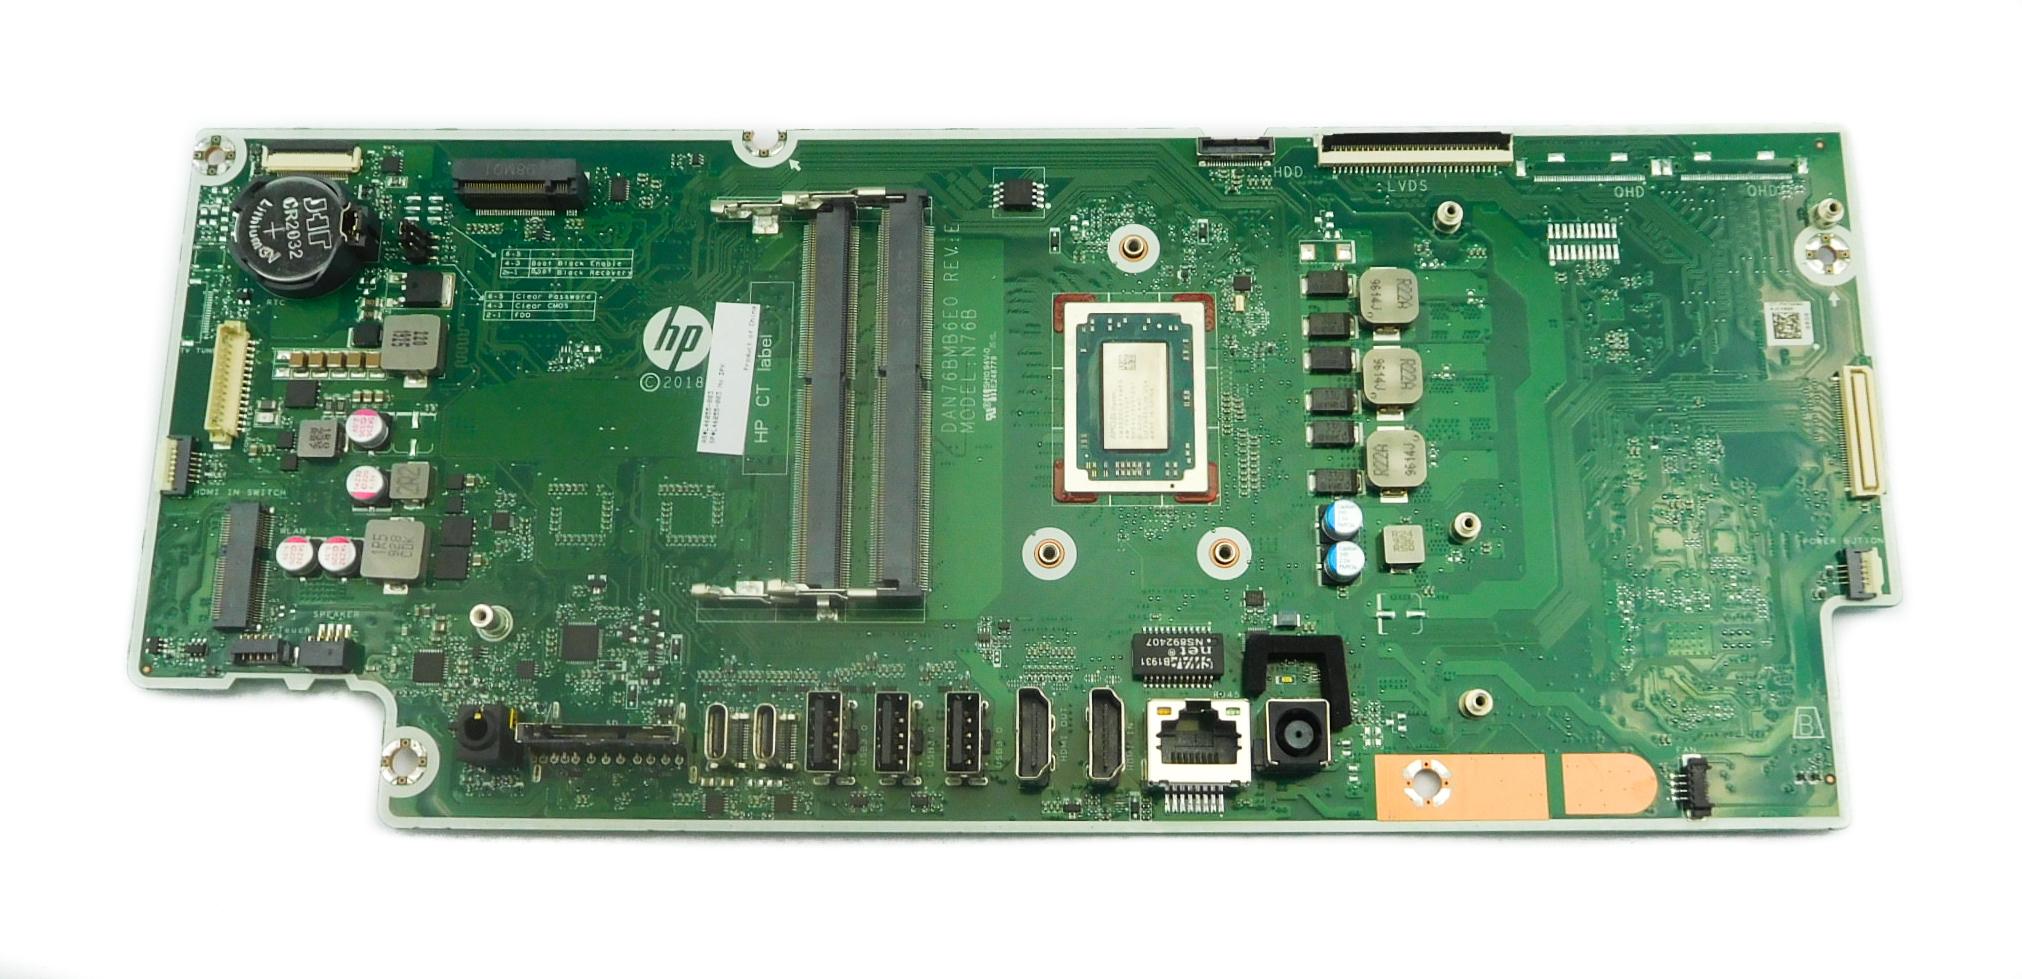 HP L46055-003 Pavilion 24-xaxxx AiO PC Motherboard /w BGA Ryzen 5 3550H CPU